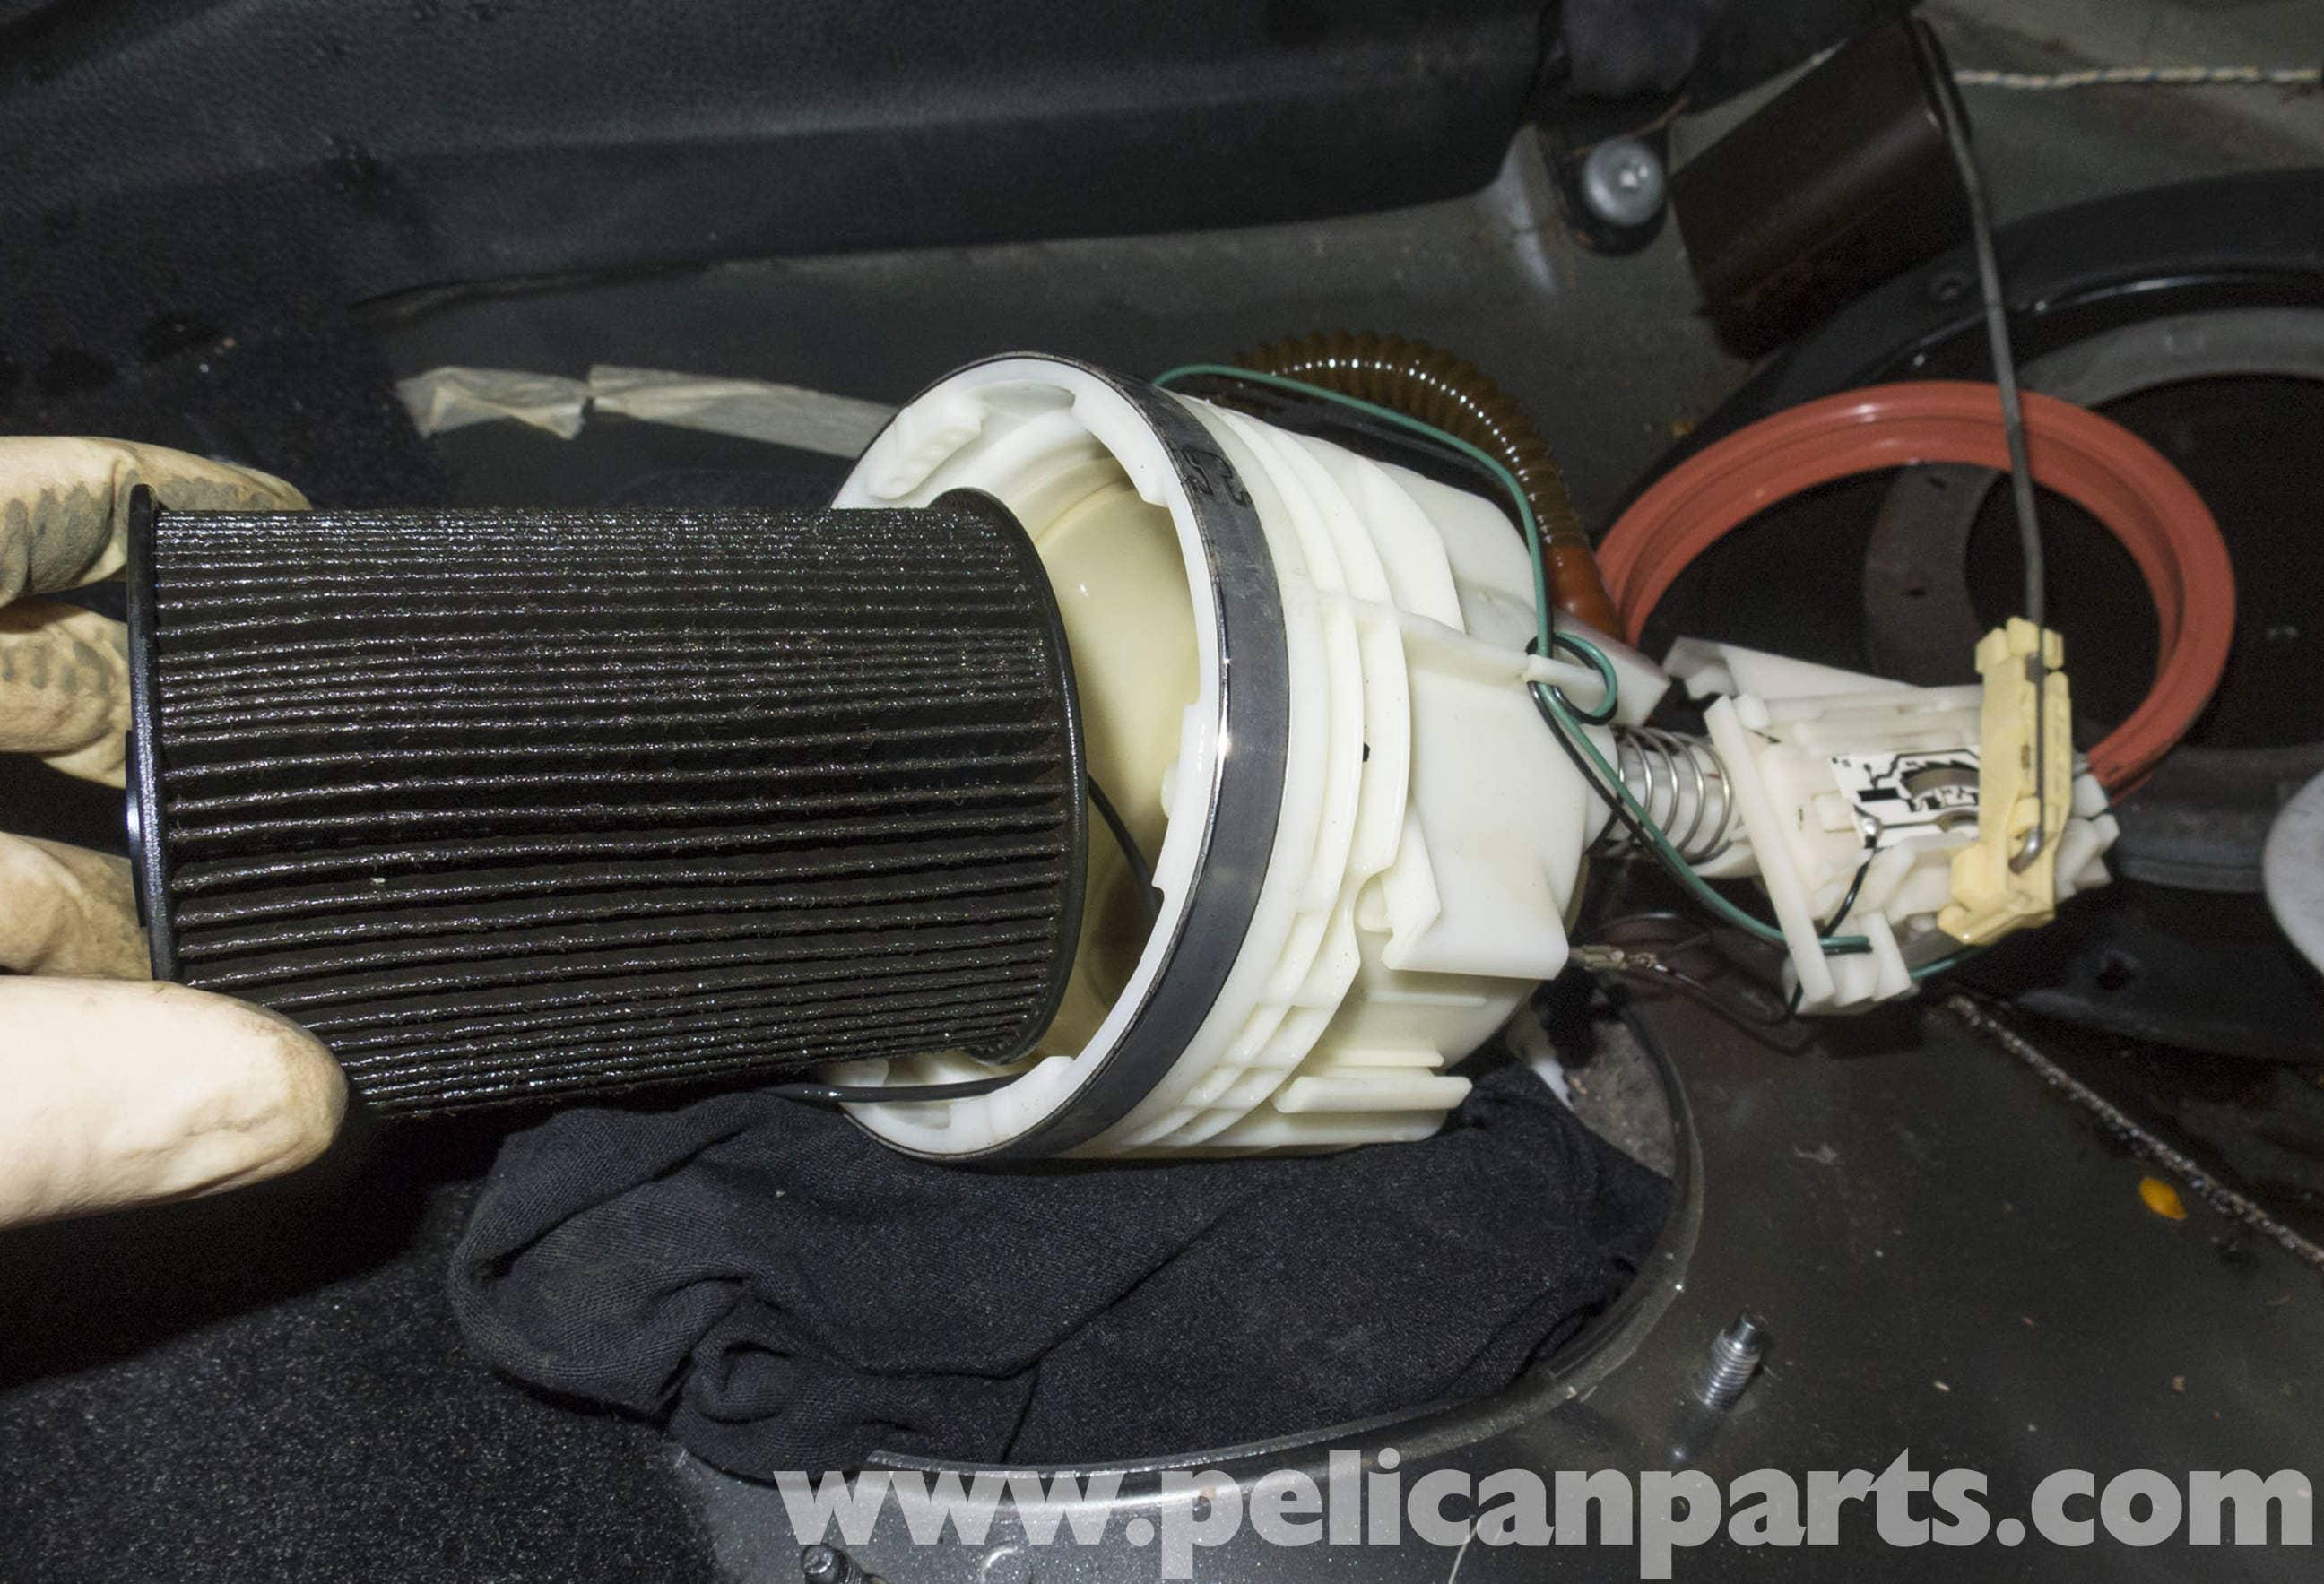 MINI Cooper R56 Fuel Filter Replacement (2007-2011) | Pelican Parts